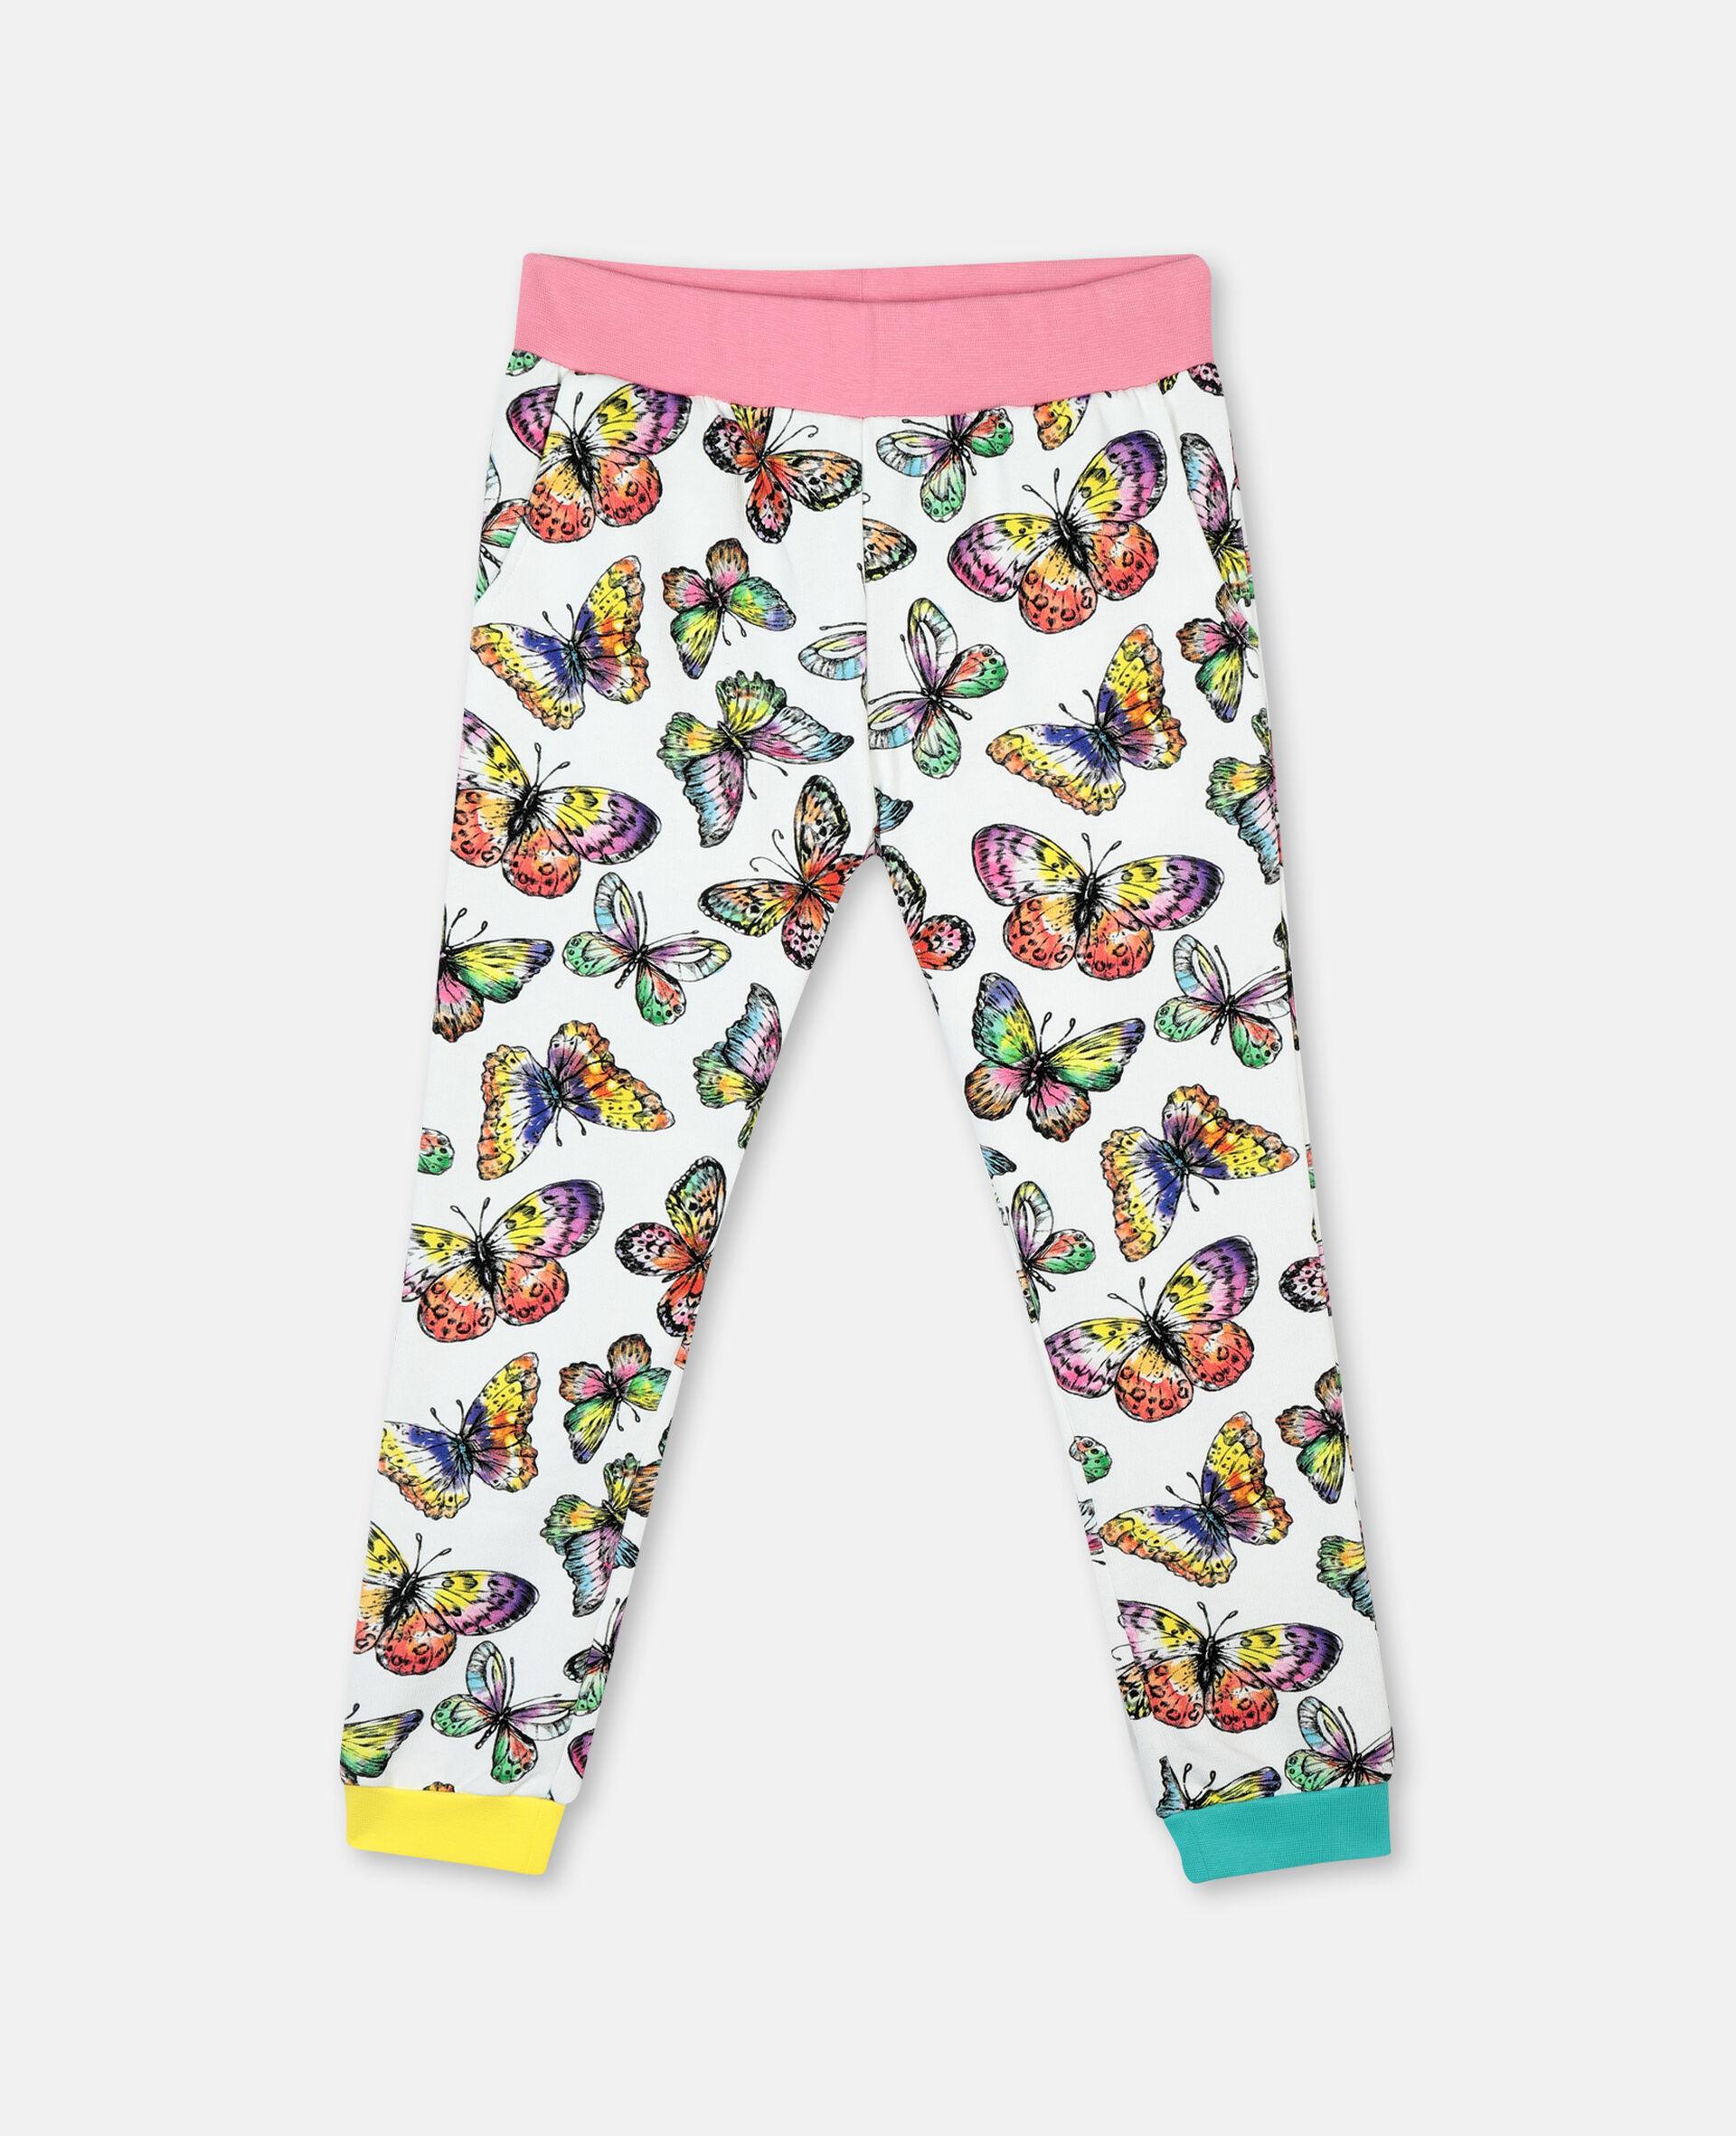 Butterfly棉质抓绒运动裤 -Multicolored-large image number 0